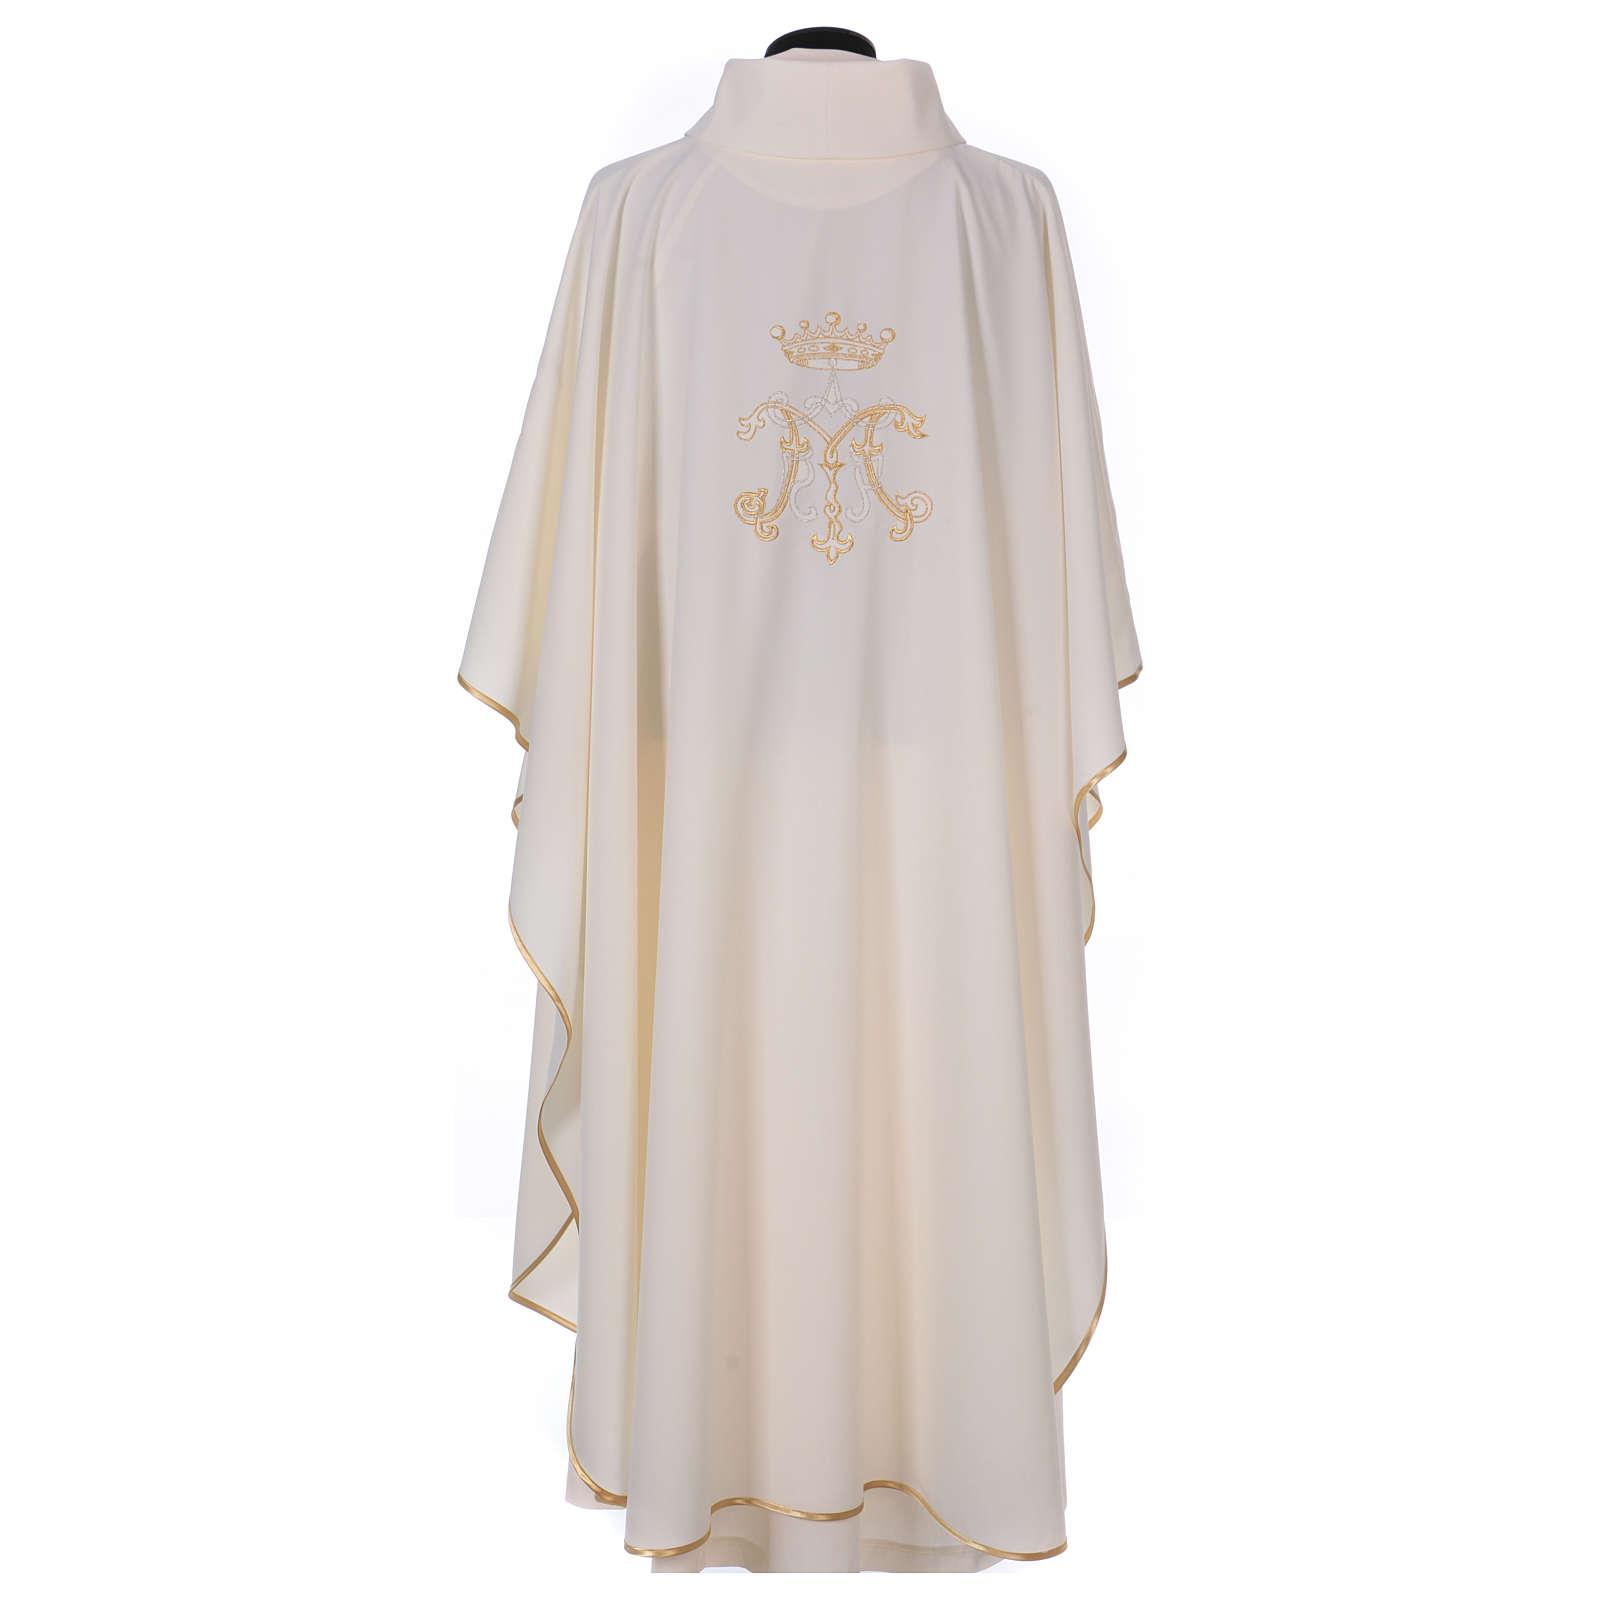 Casula  ricamata simbolo mariano 100% poliestere 4